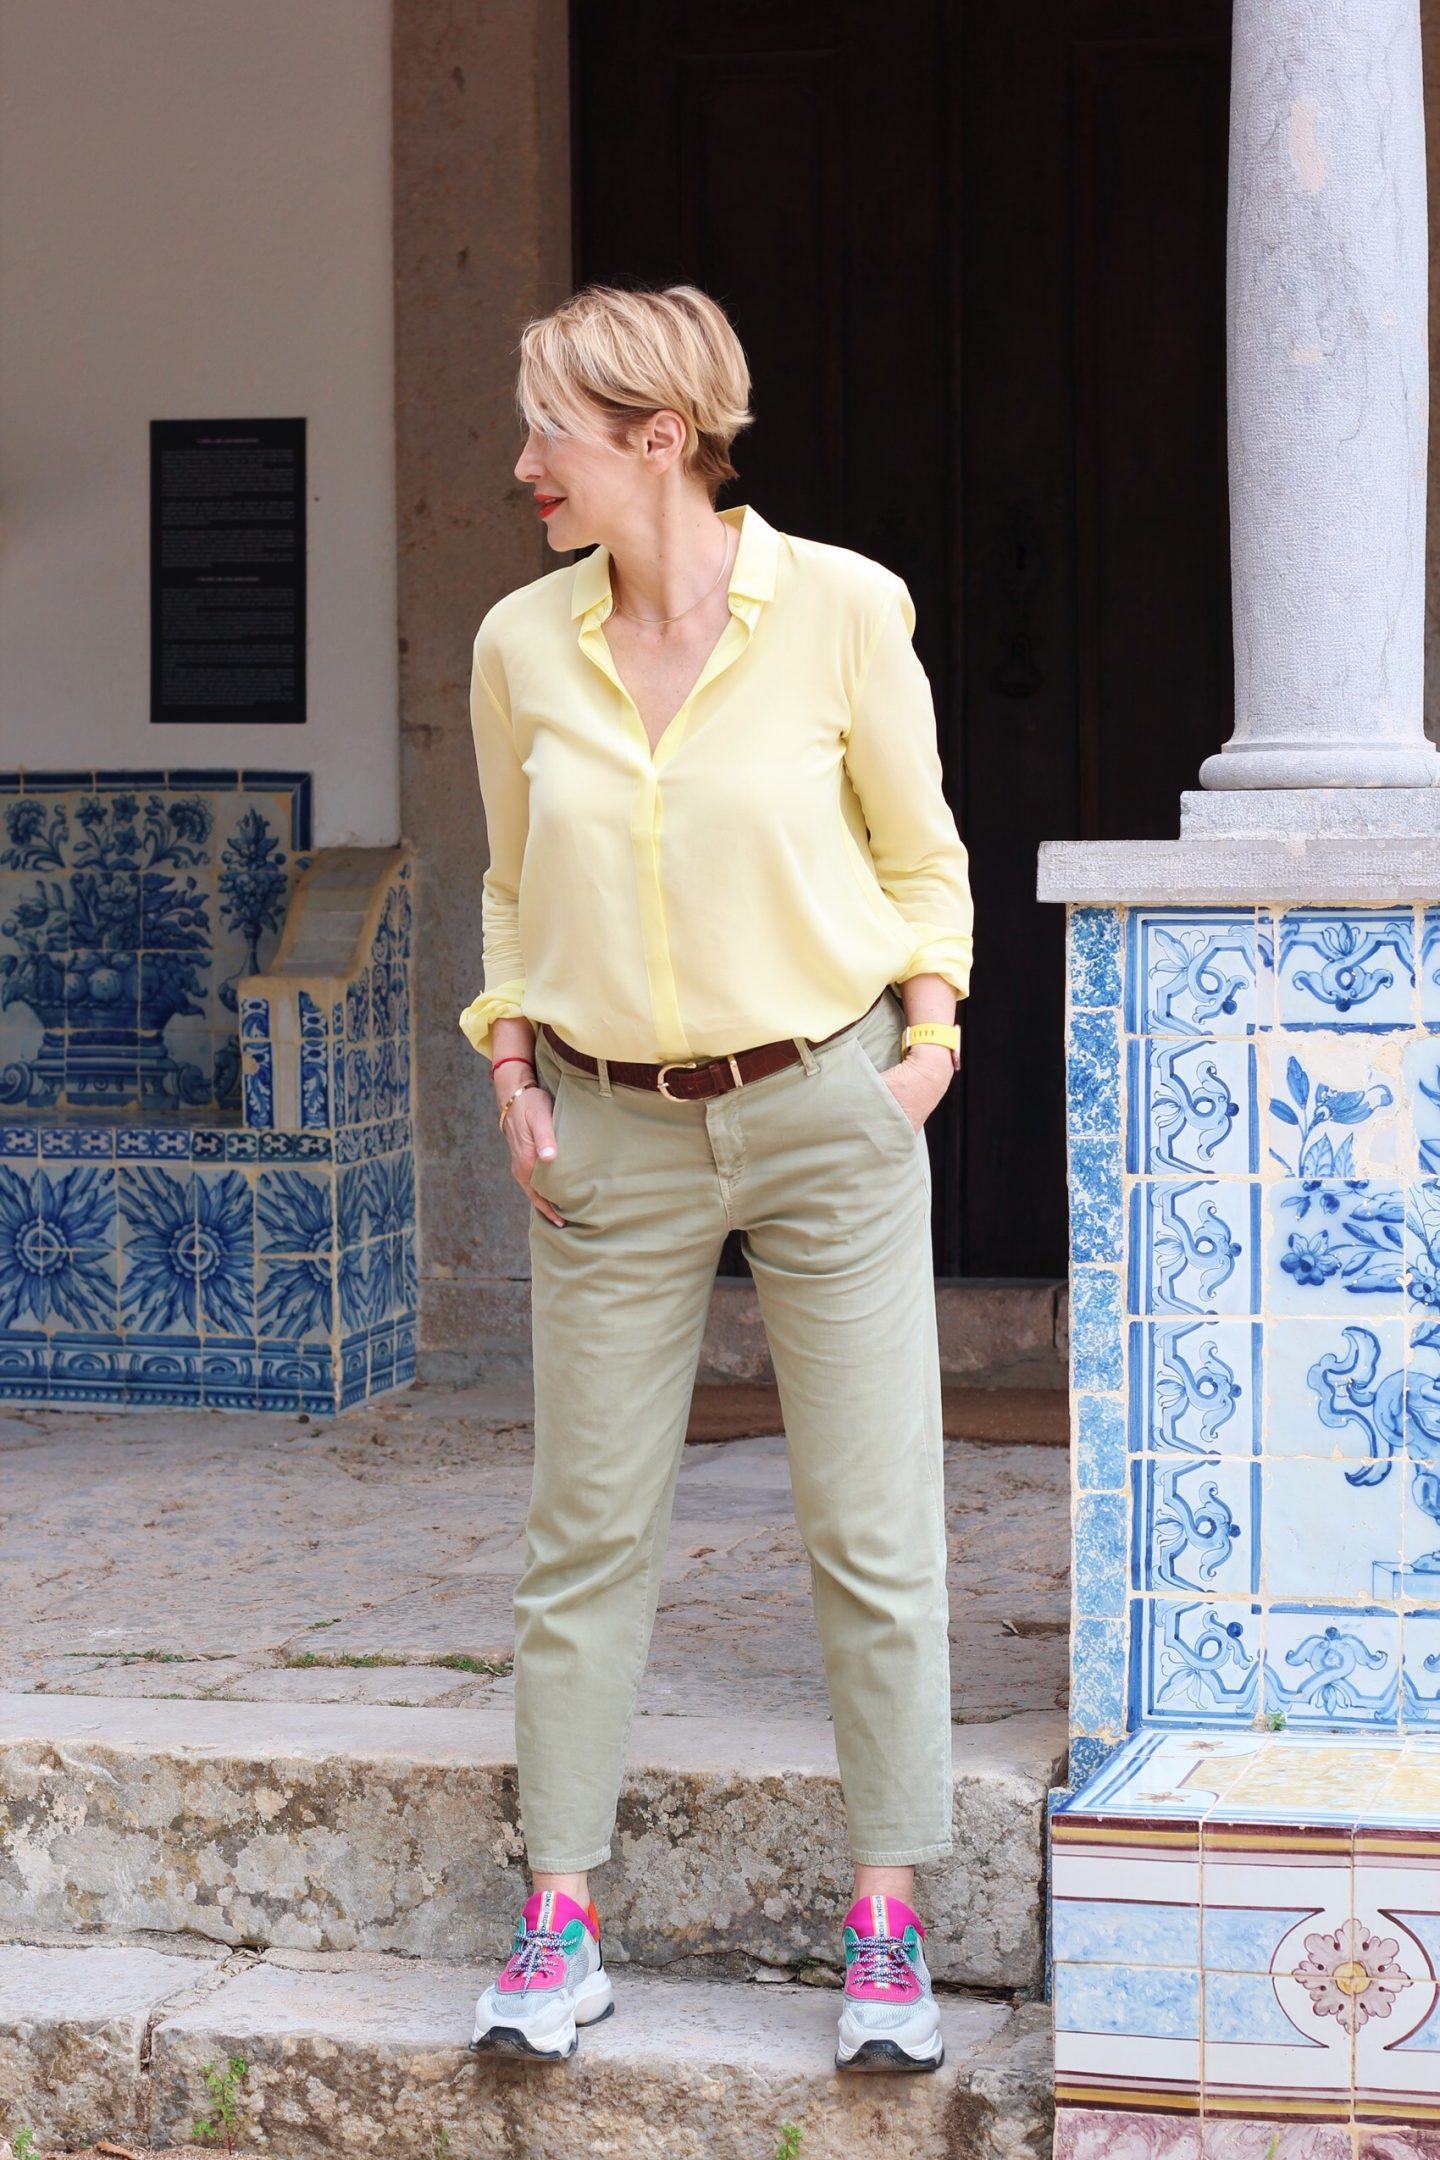 glamupyourlifestyle chino-hosen sommerhosen slipper business-outfit büro-look ü-40-blog ü-50-blog ue-40-blog